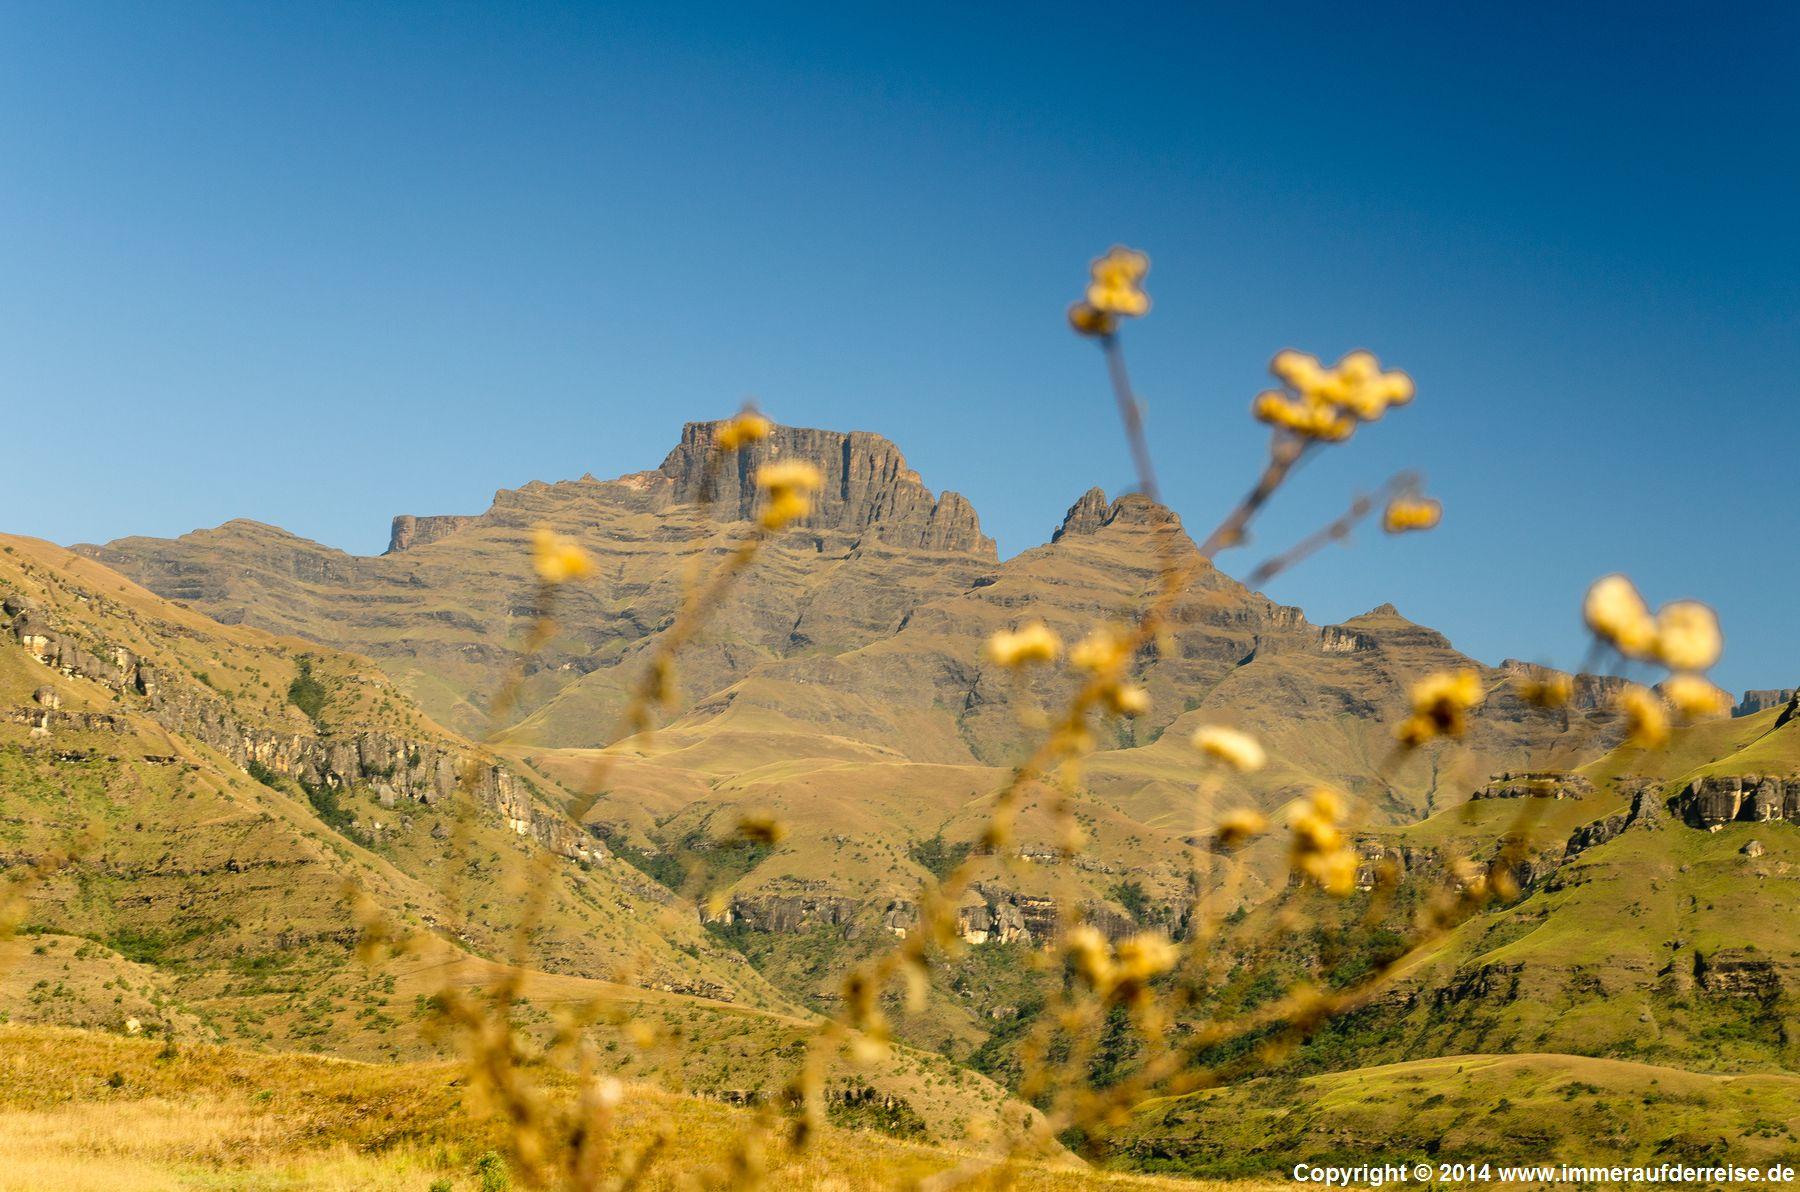 Im Champagner Tal in den zentralen Drakensbergen